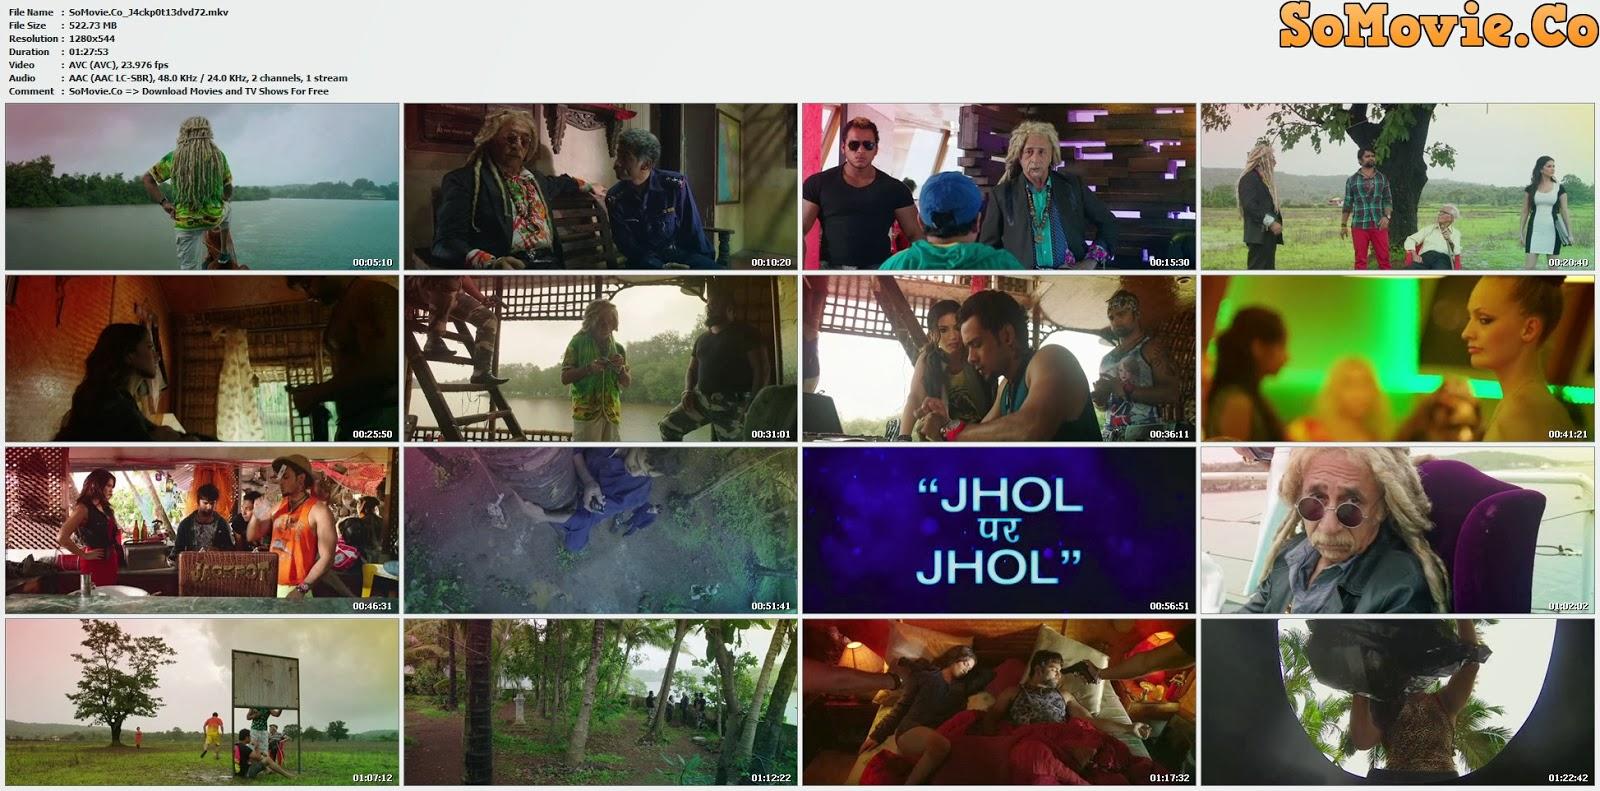 movie screenshot of Jackpot fdmovie.com